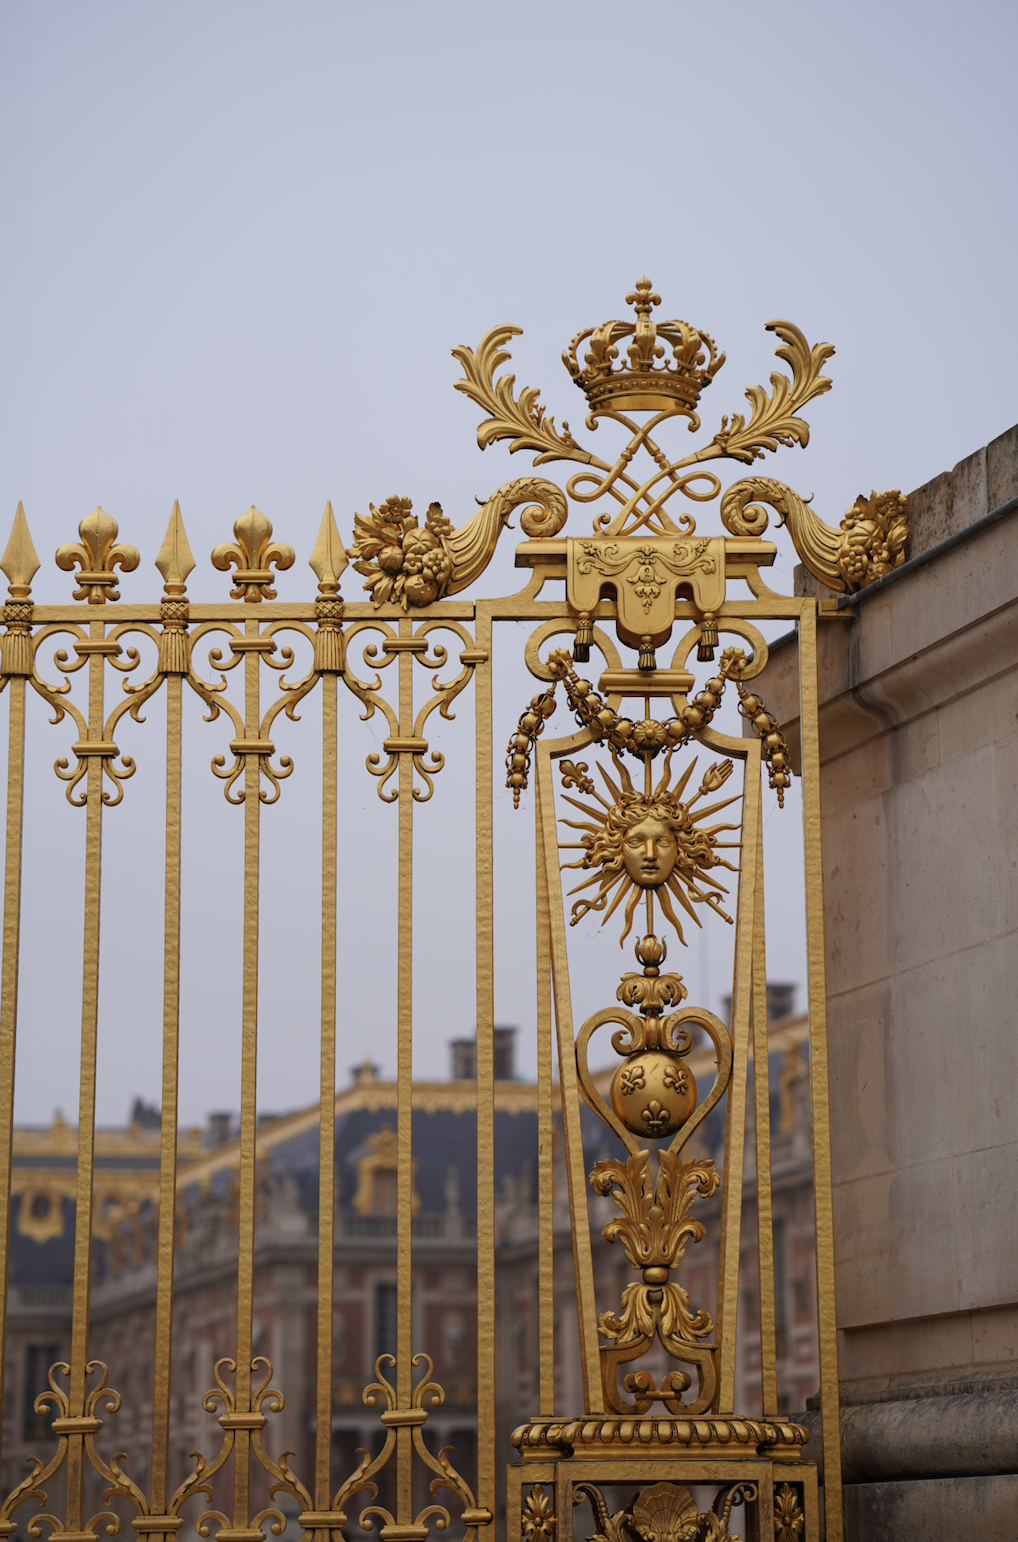 Chandelier-Paris-Versaille-Inspiration.png